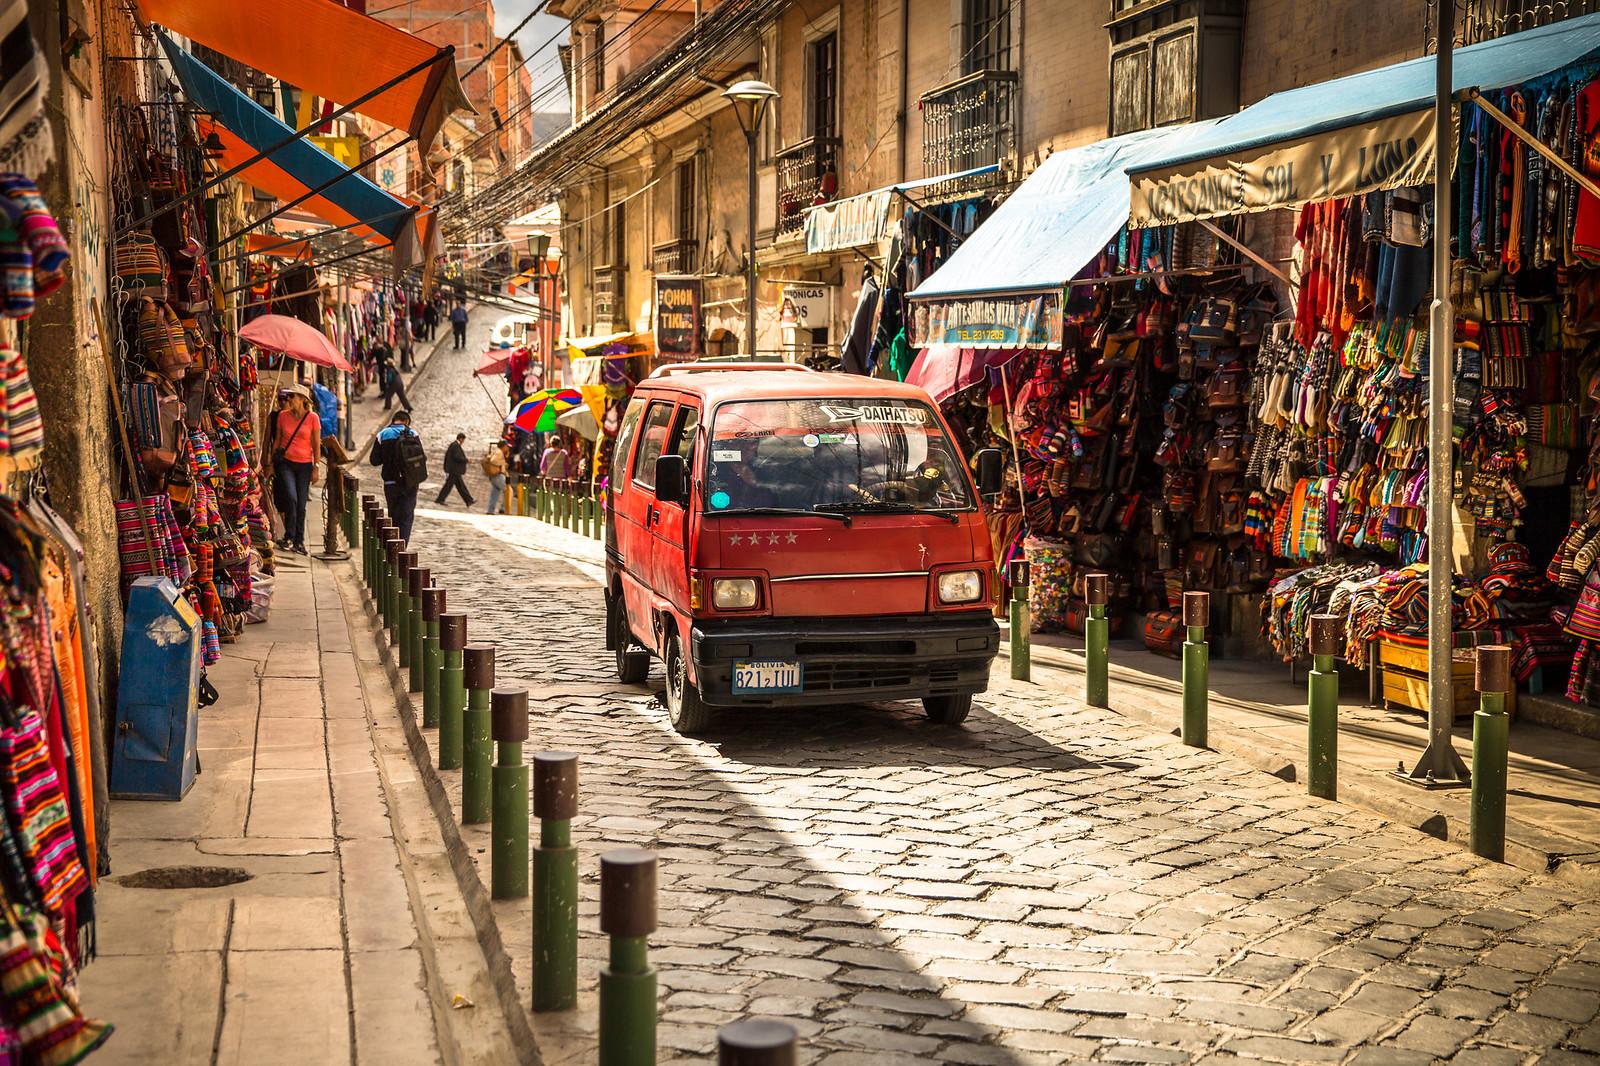 Canon單眼相機 - [8/23 阿雷基帕]秘魯 玻利維亞 智利『印加傳奇。小資族探索祕境之旅』 - 相機討論區 - Mobile01